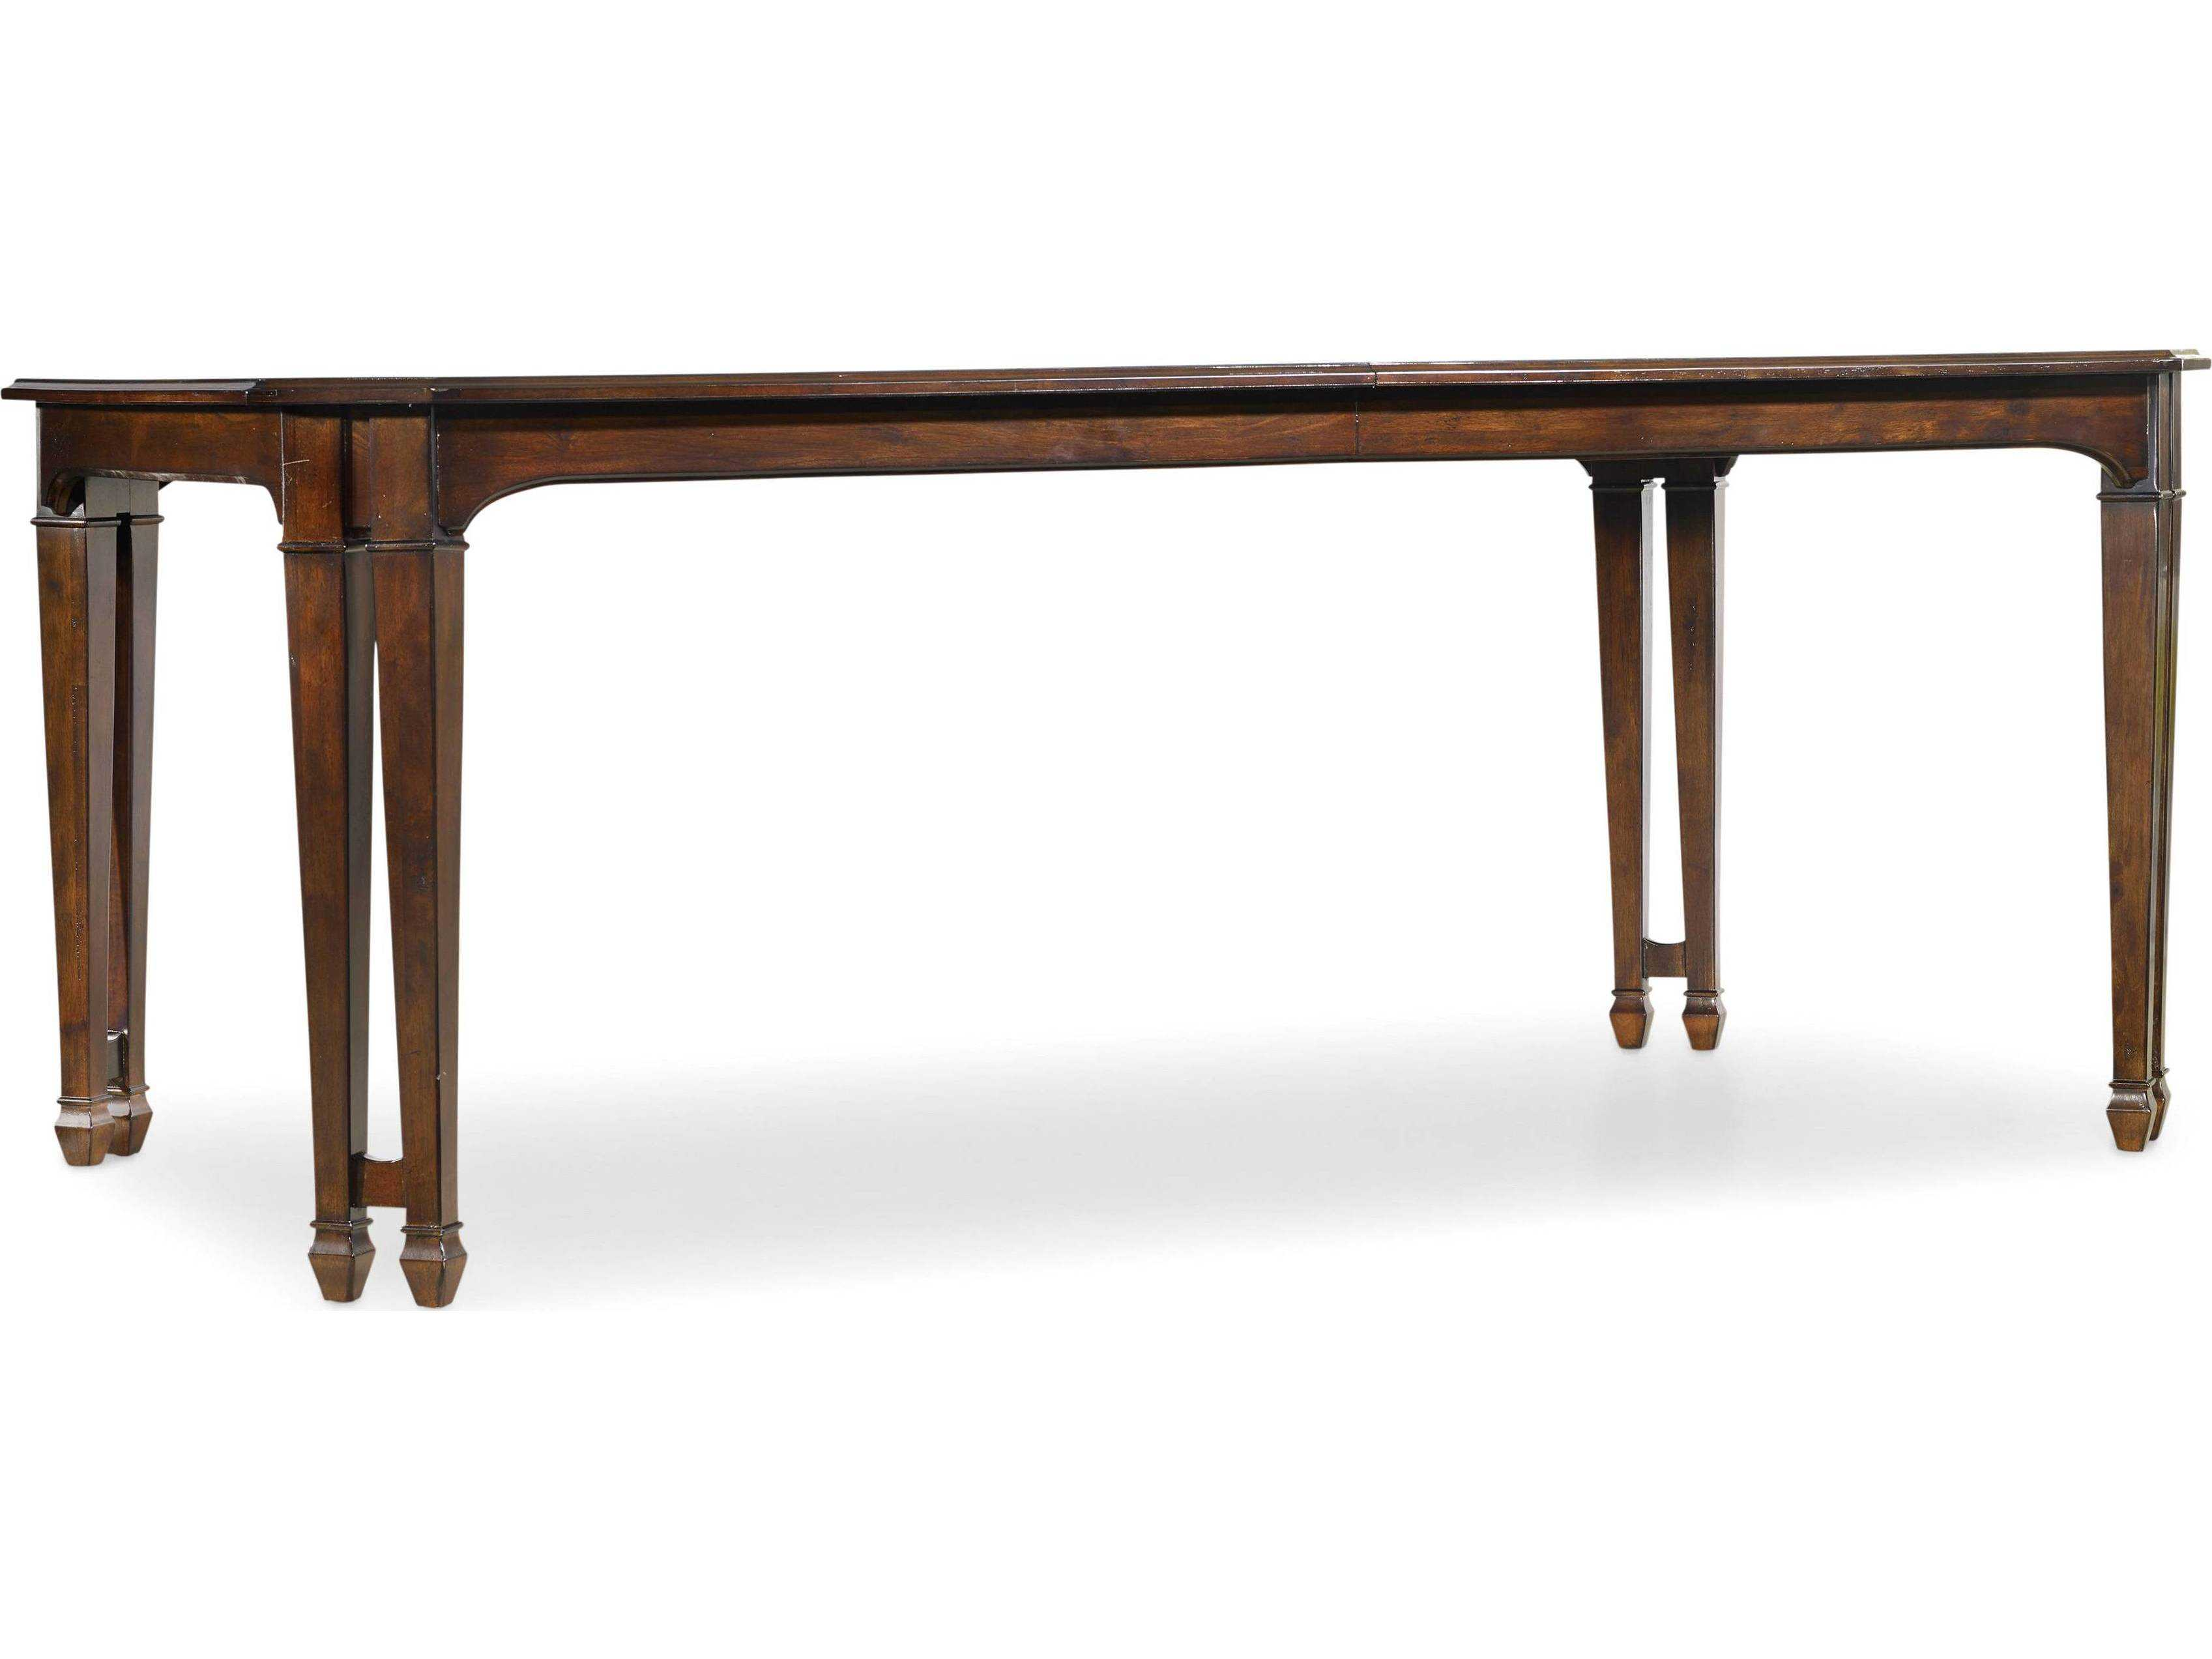 dark wood 76 39 39 l x 44 39 39 w rectangular dining table hoo518